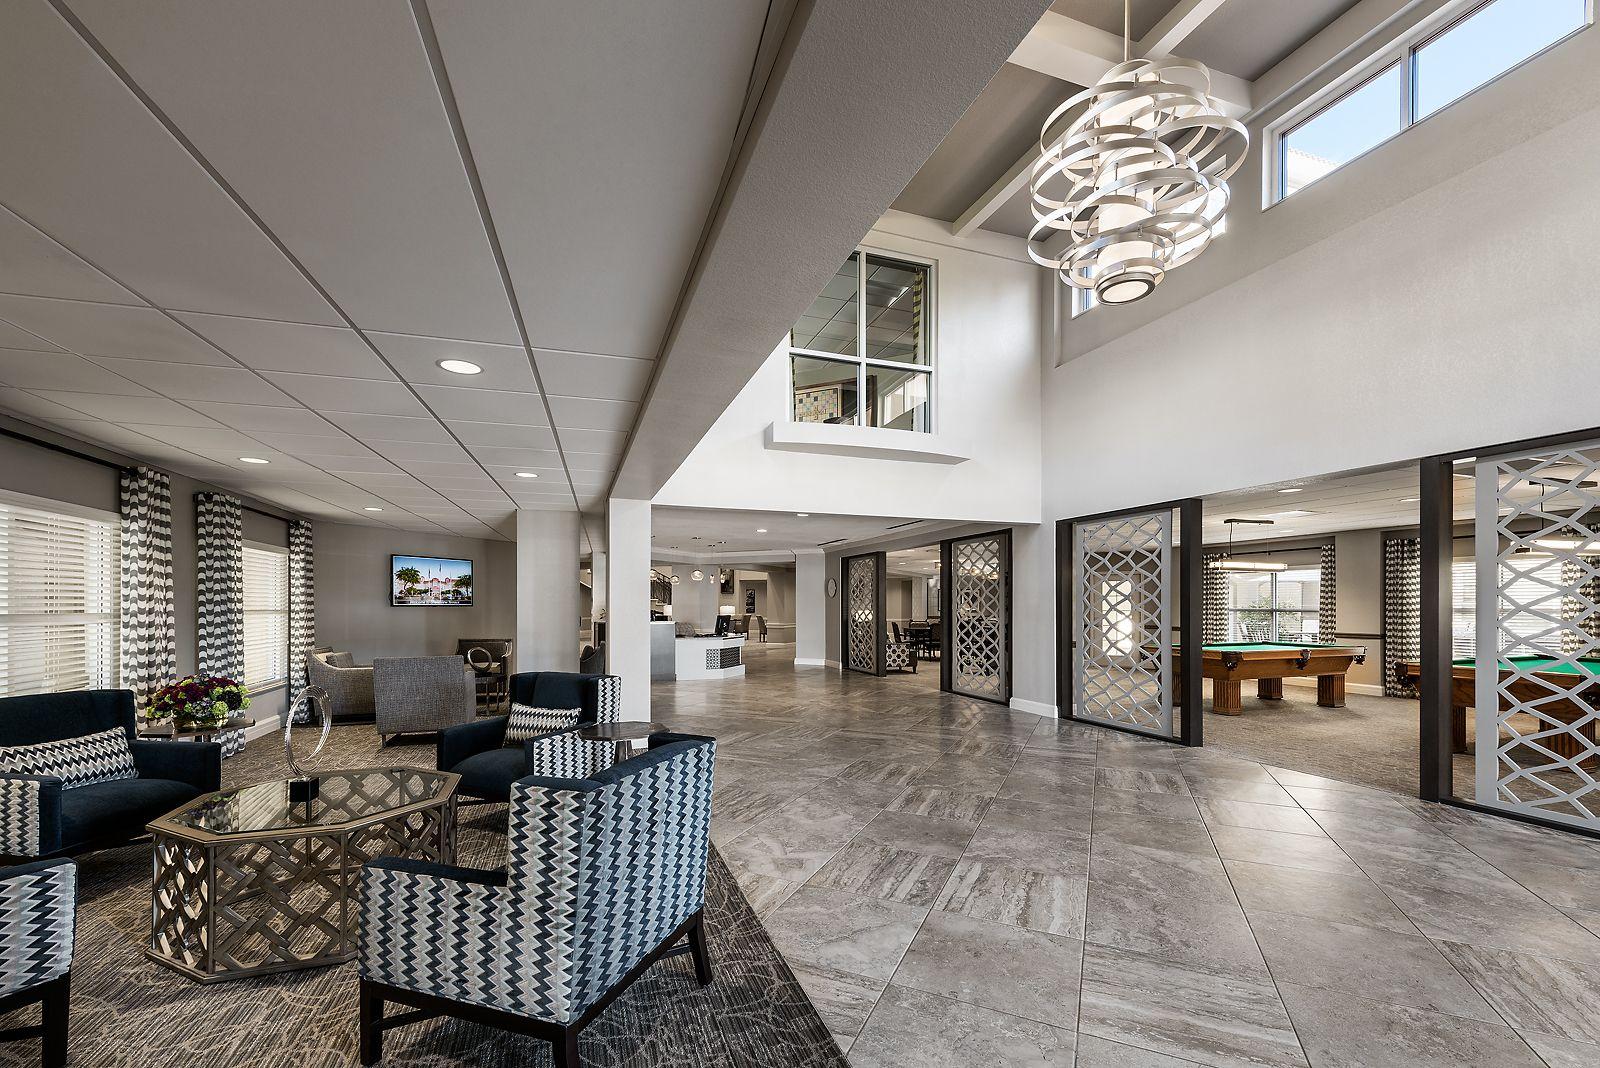 Pin On Senior Living Interior Design